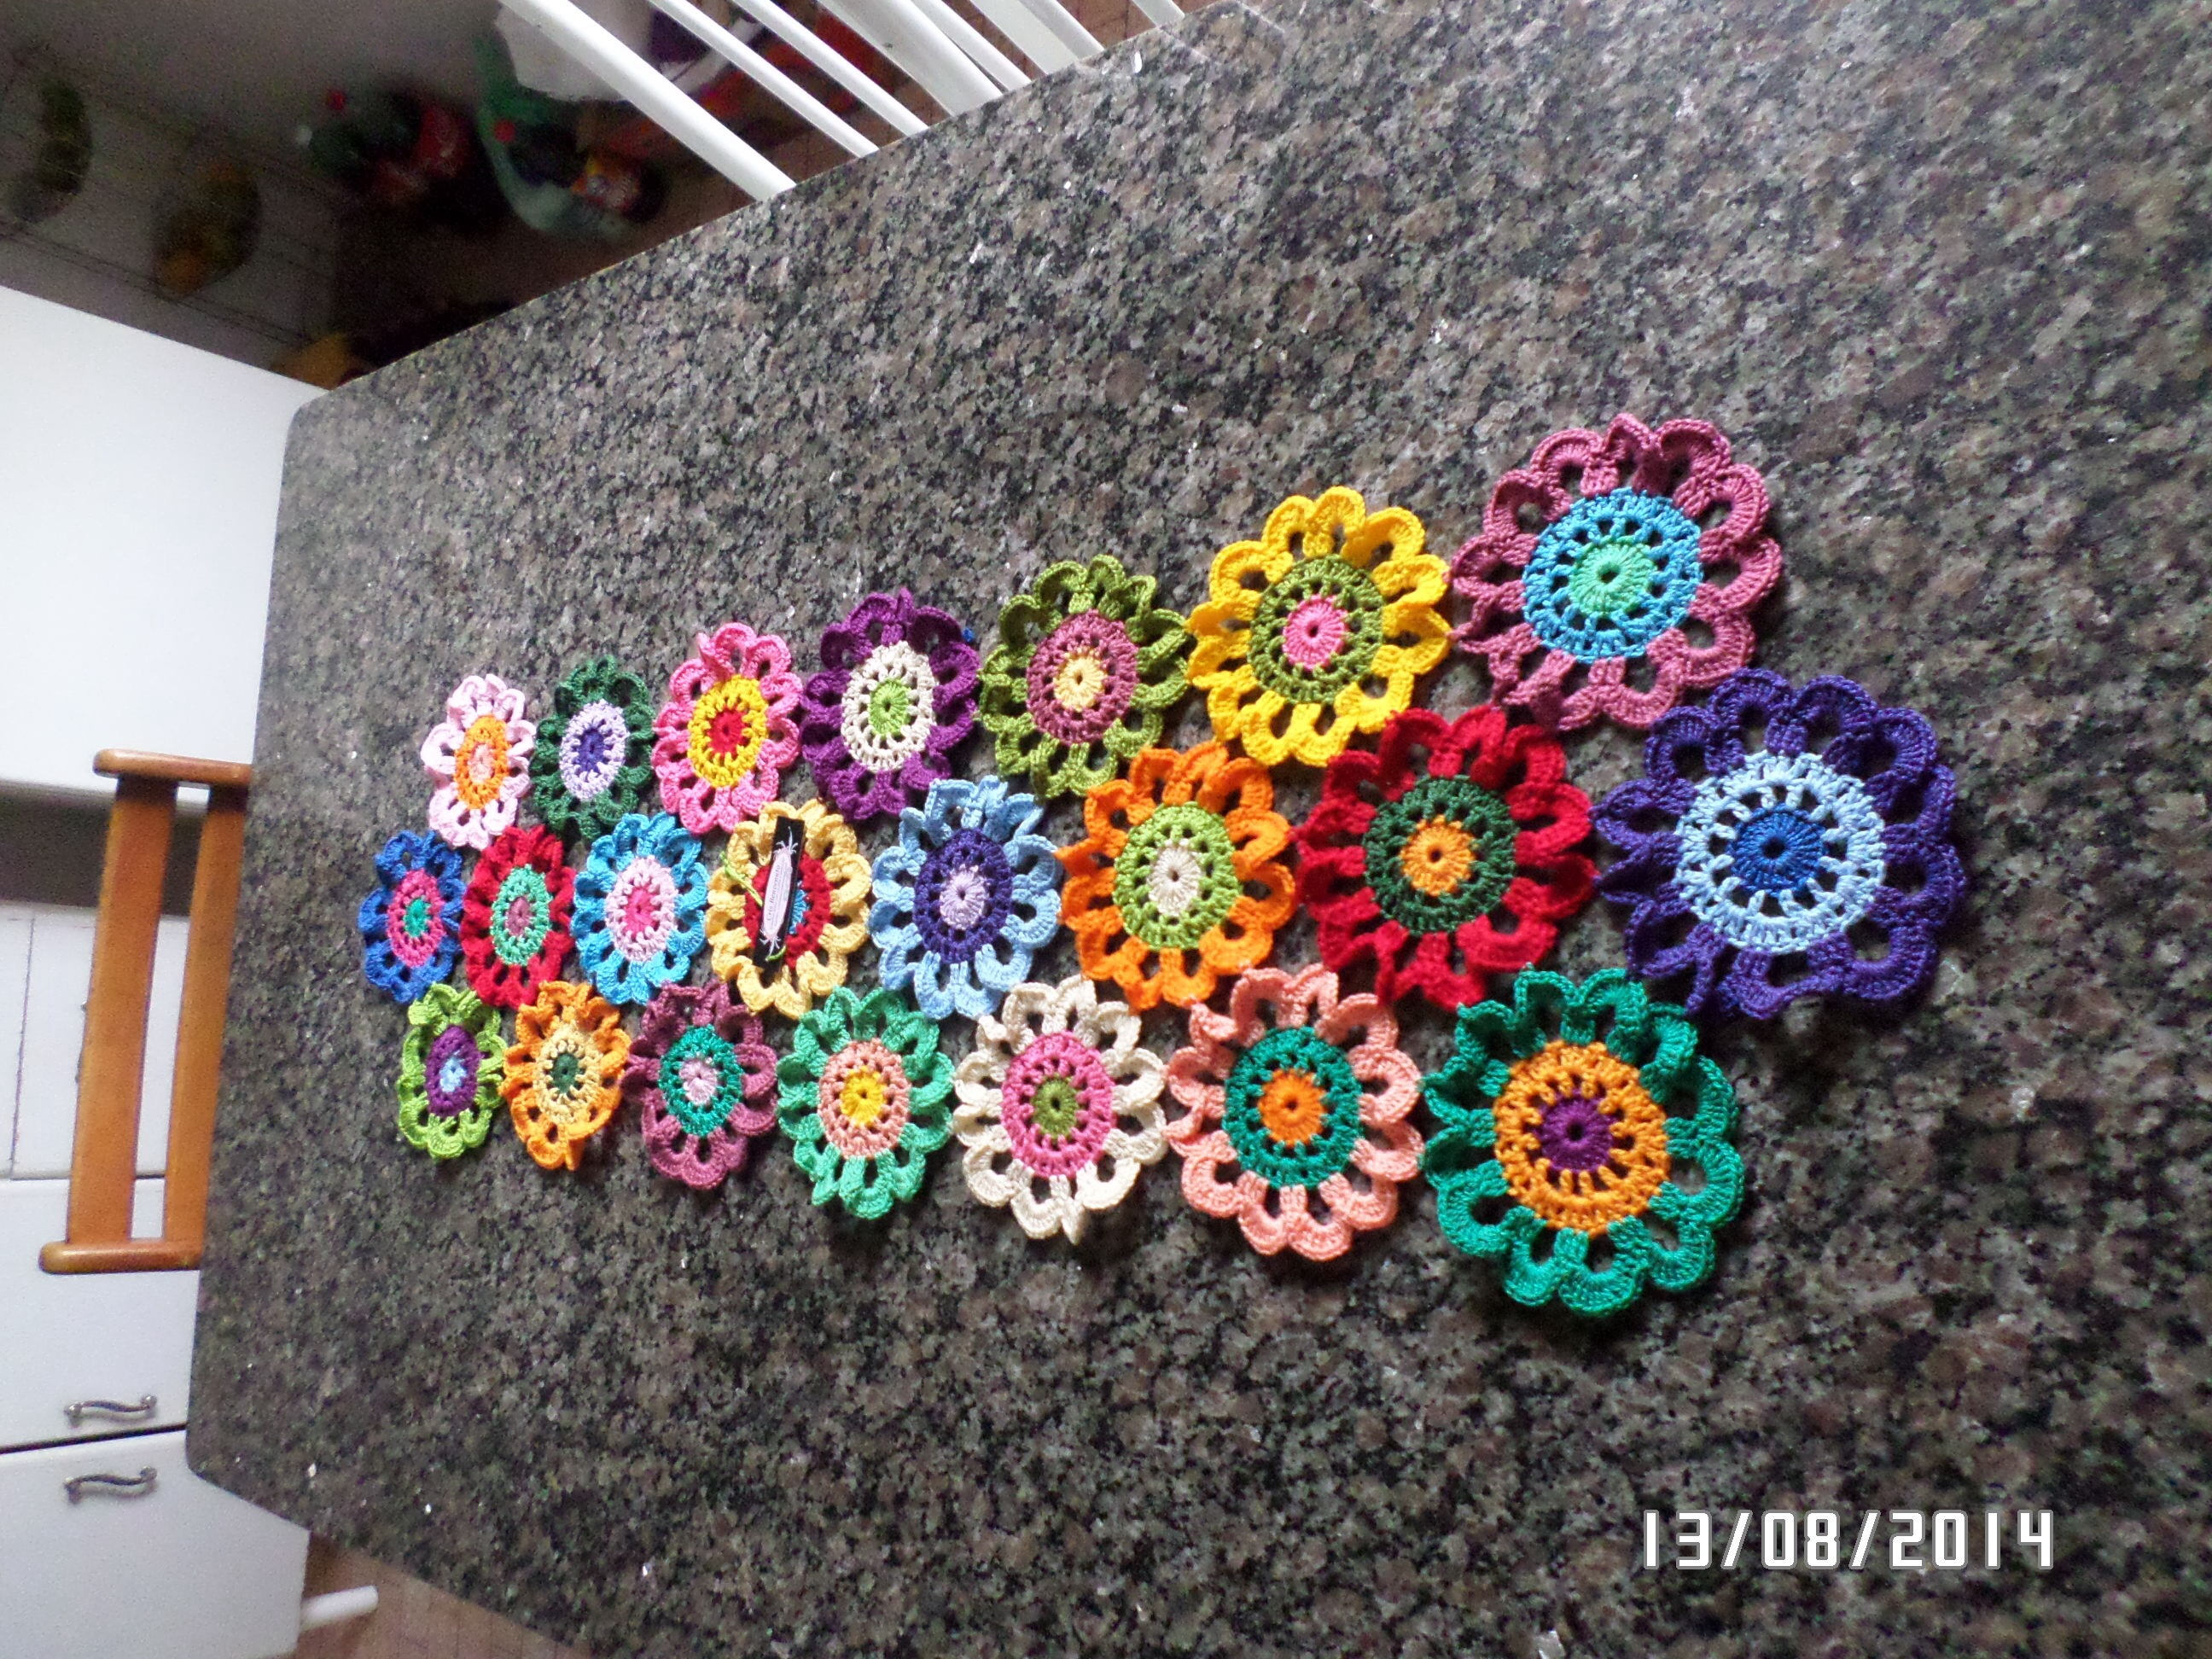 fotos de jardim florido : fotos de jardim florido:trilho de mesa jardim florido 1 caminho de mesa